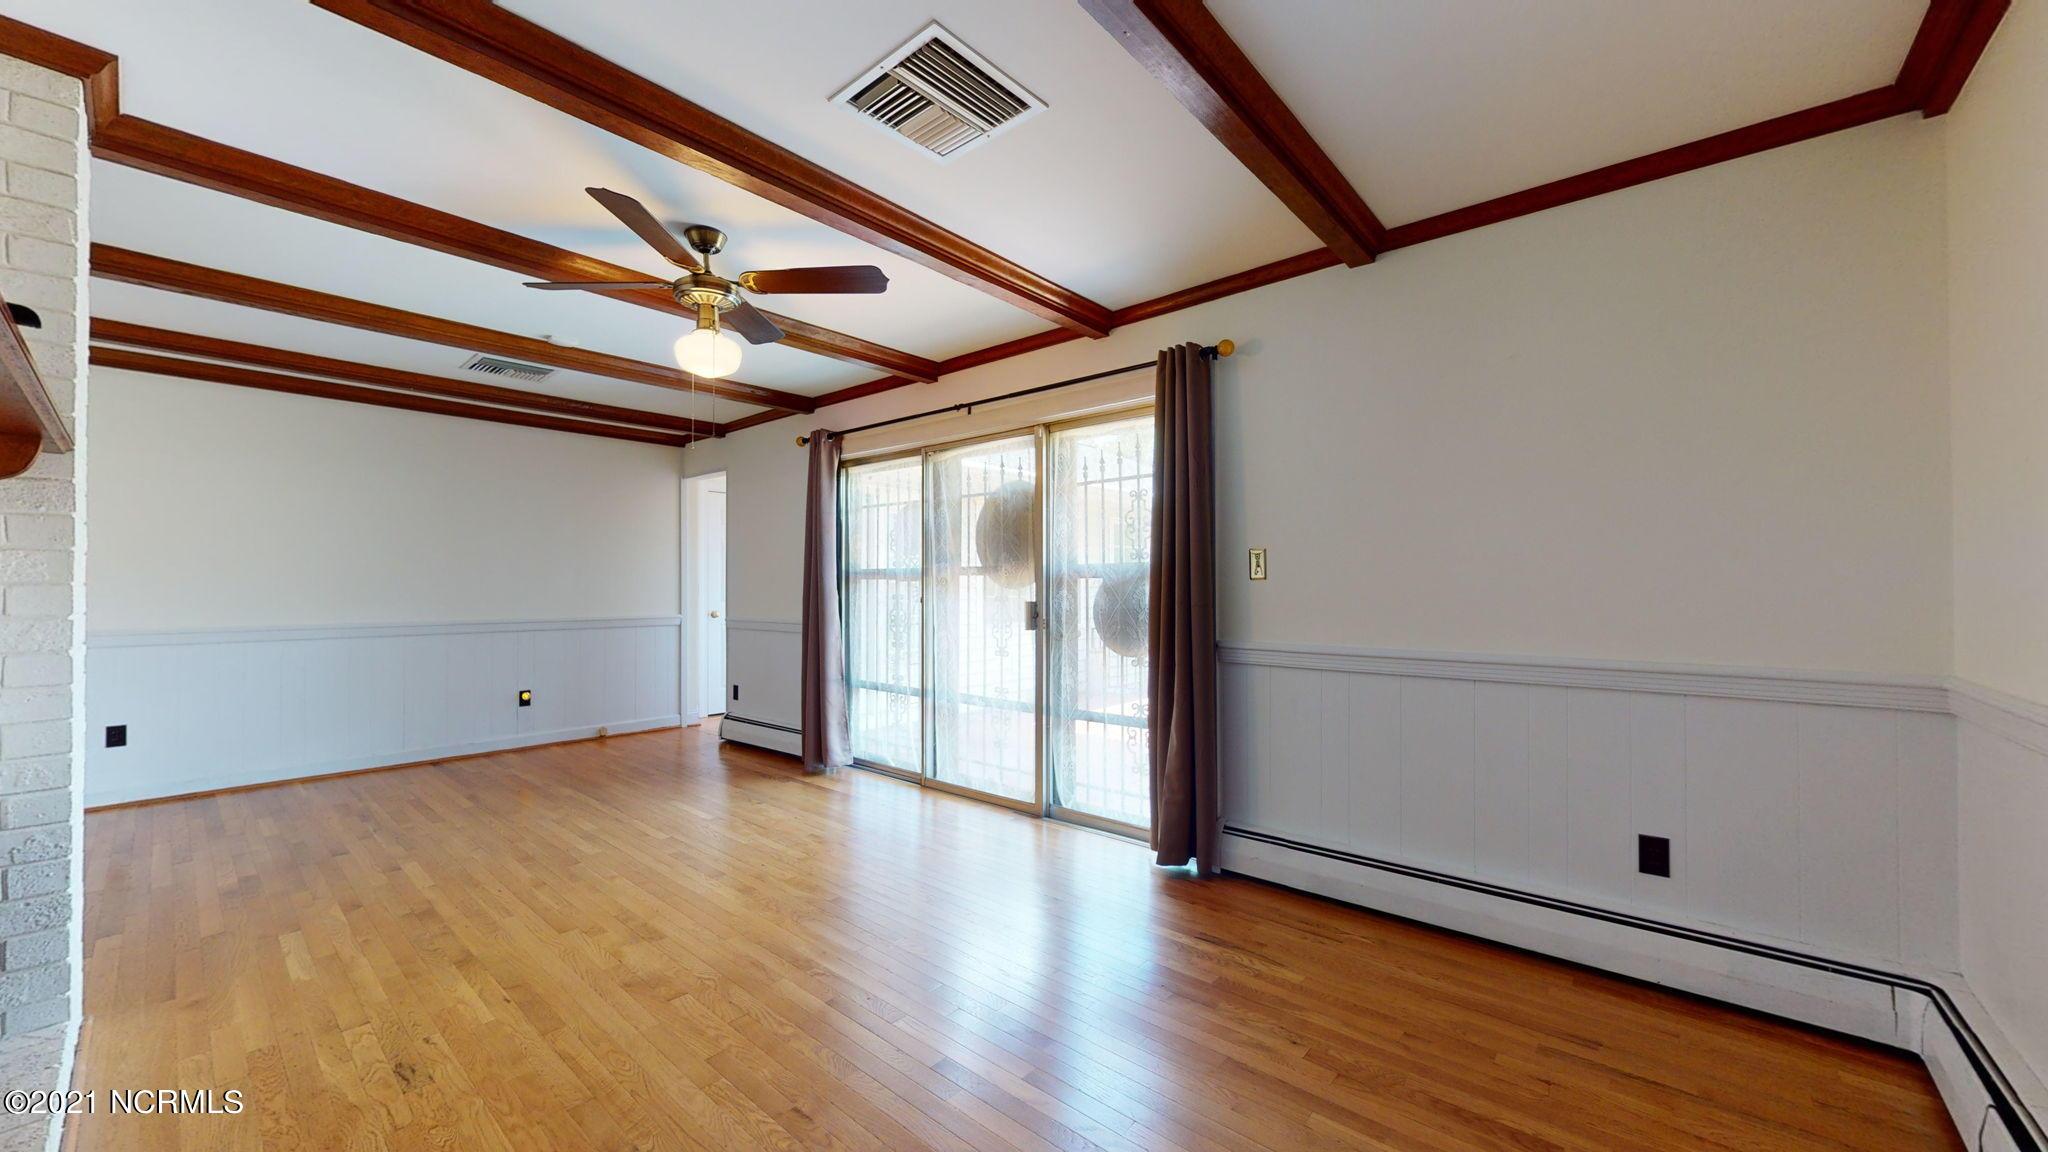 1101 Oakview Drive, Greenville, North Carolina 27858, 5 Bedrooms Bedrooms, 9 Rooms Rooms,4 BathroomsBathrooms,Single family residence,For sale,Oakview,100285682